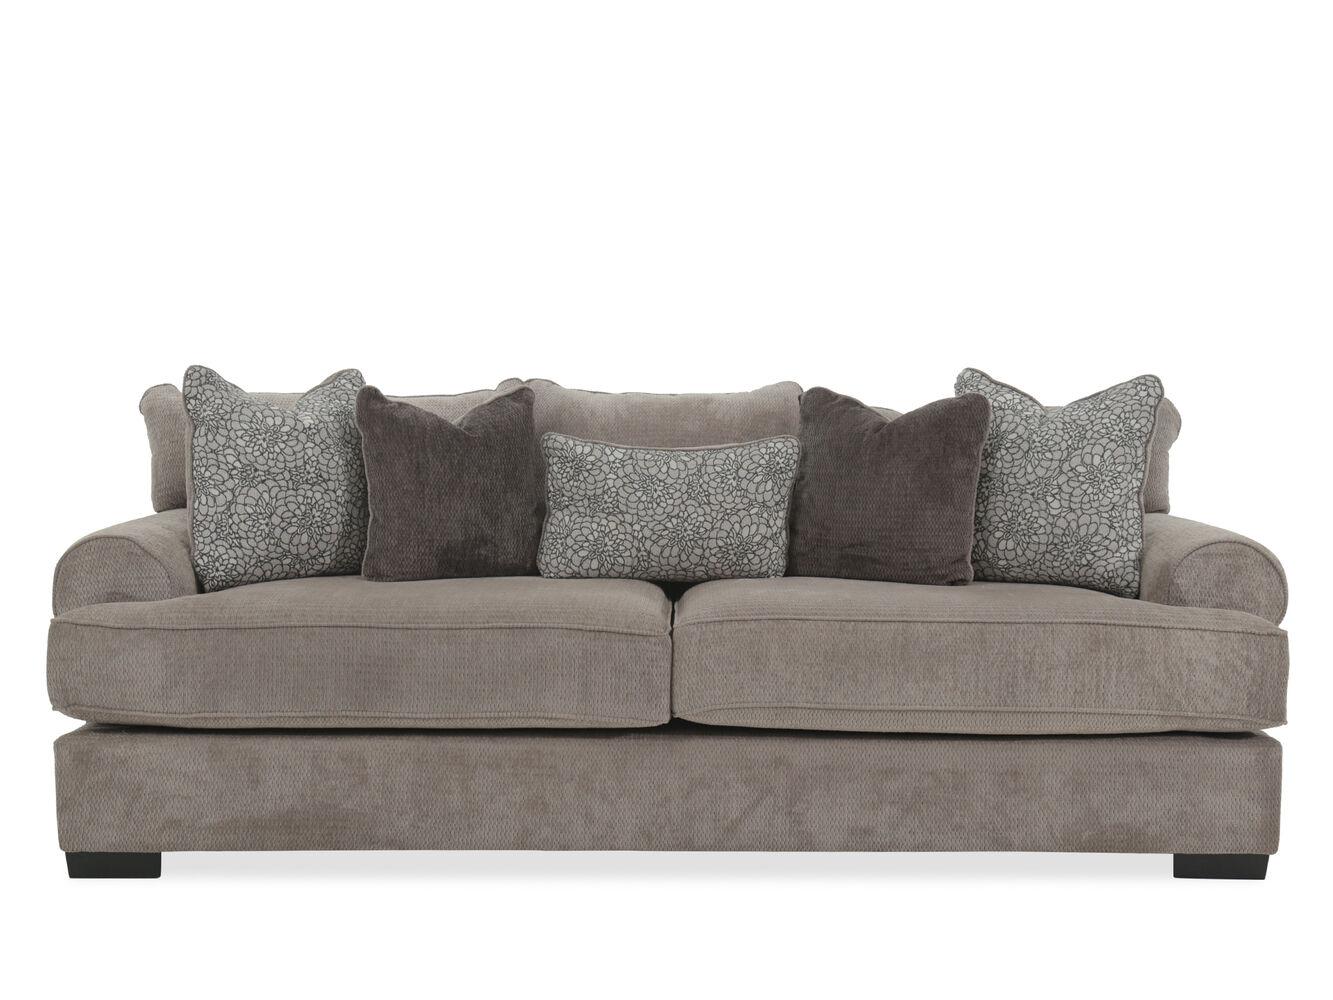 michael nicholas sofa michael nicholas designs living room alexander sofa 043694 thesofa. Black Bedroom Furniture Sets. Home Design Ideas